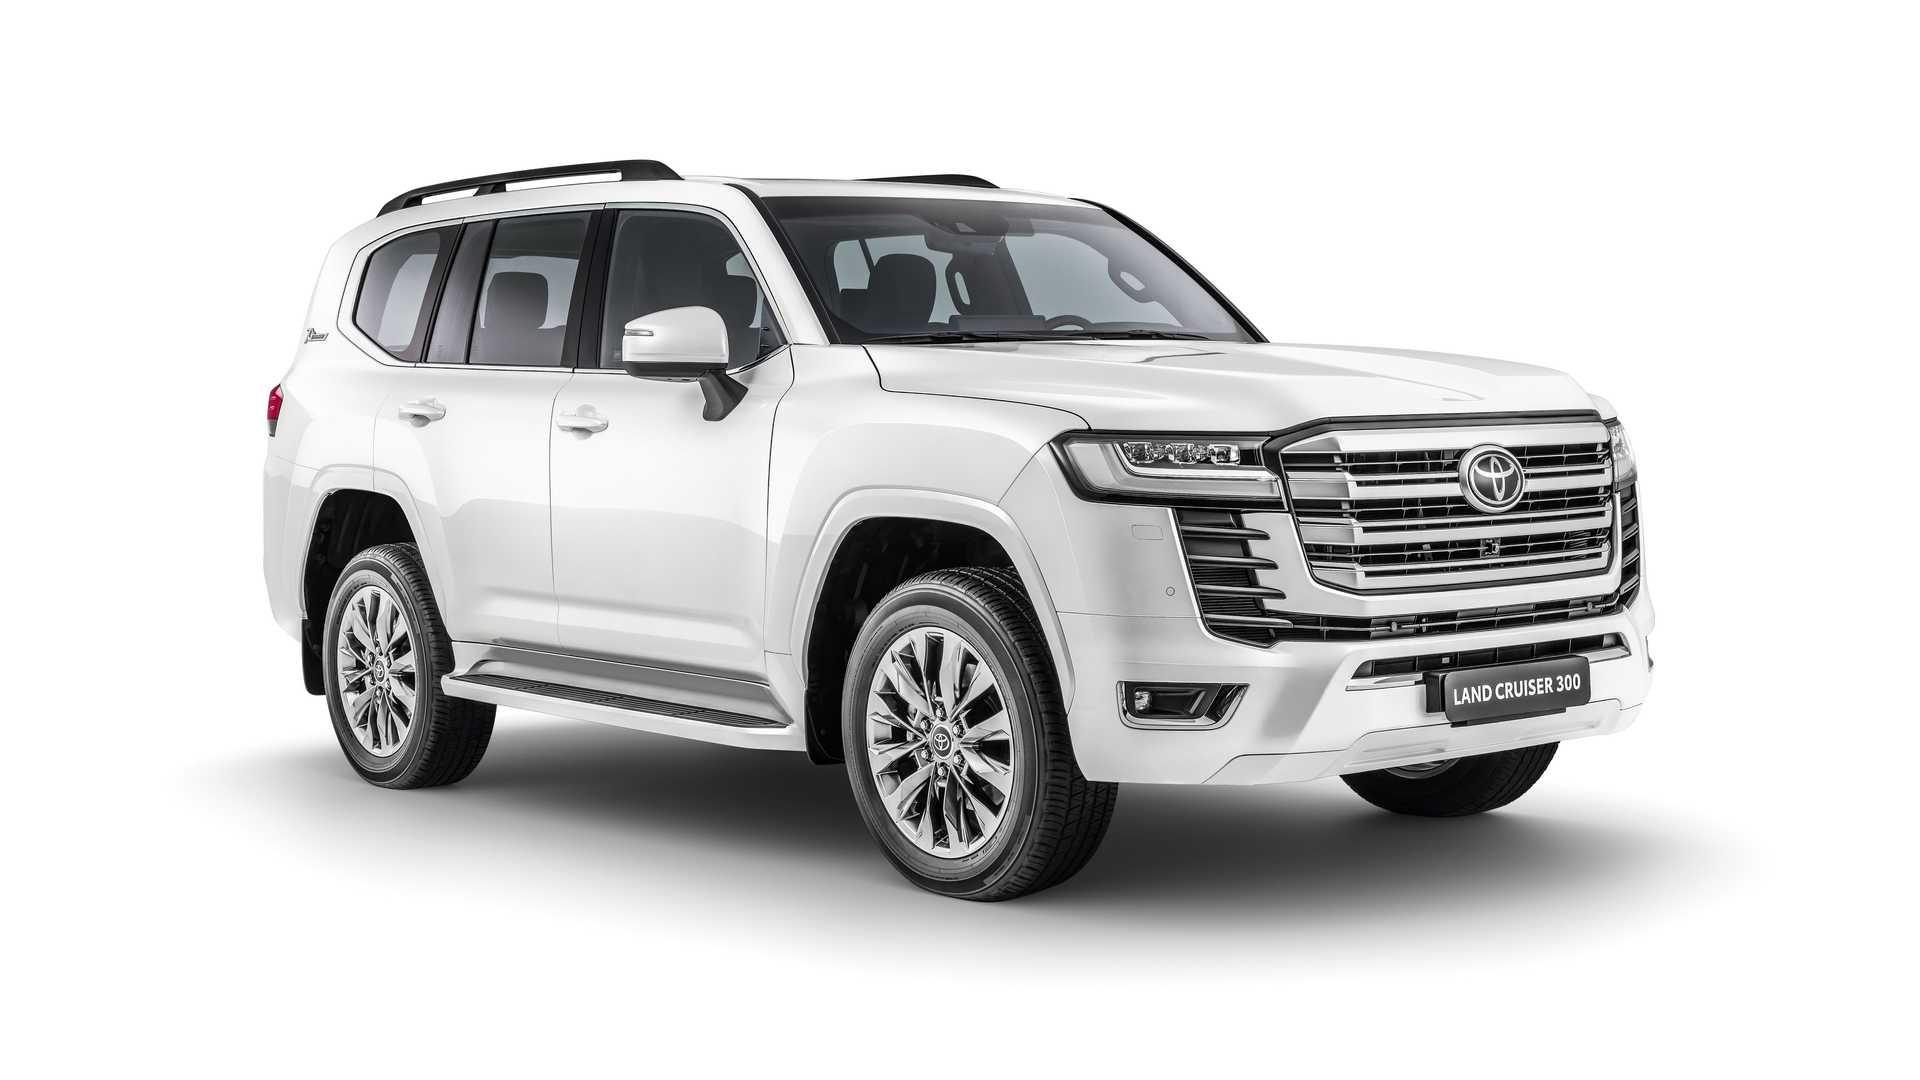 Toyota представила нове покоління позашляховика Land Cruiser